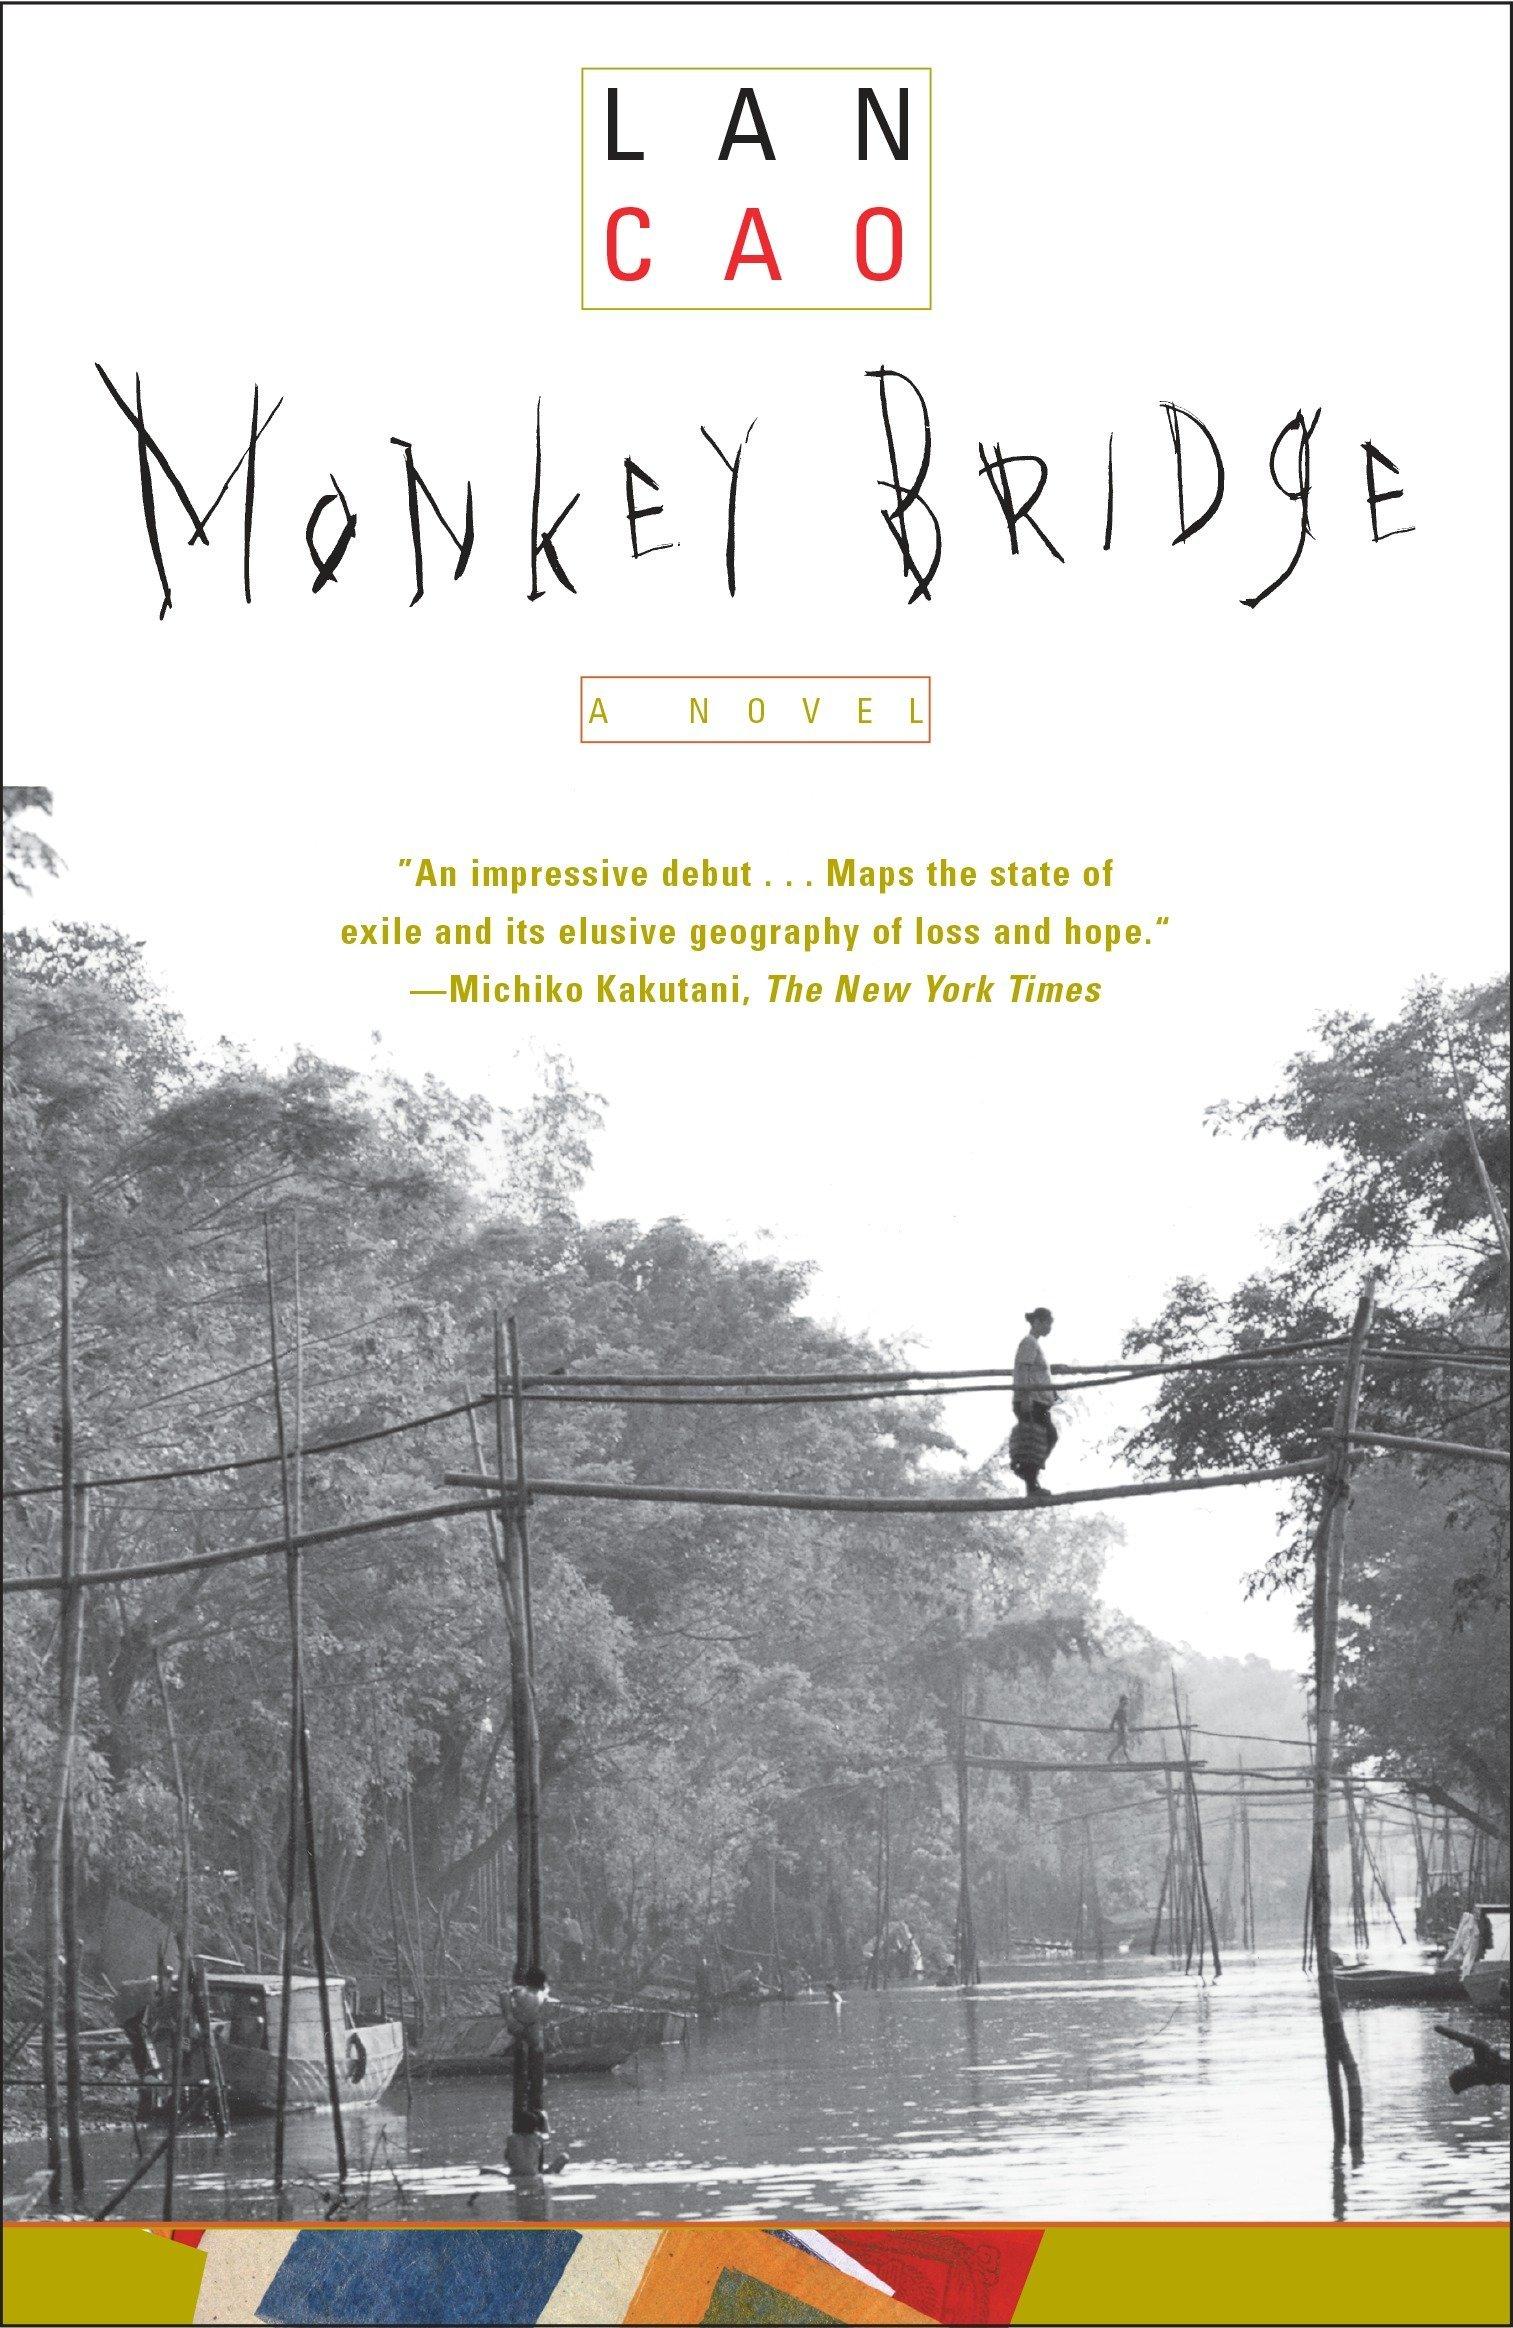 Amazon.com: Monkey Bridge (9780140263619): Cao, Lan: Books